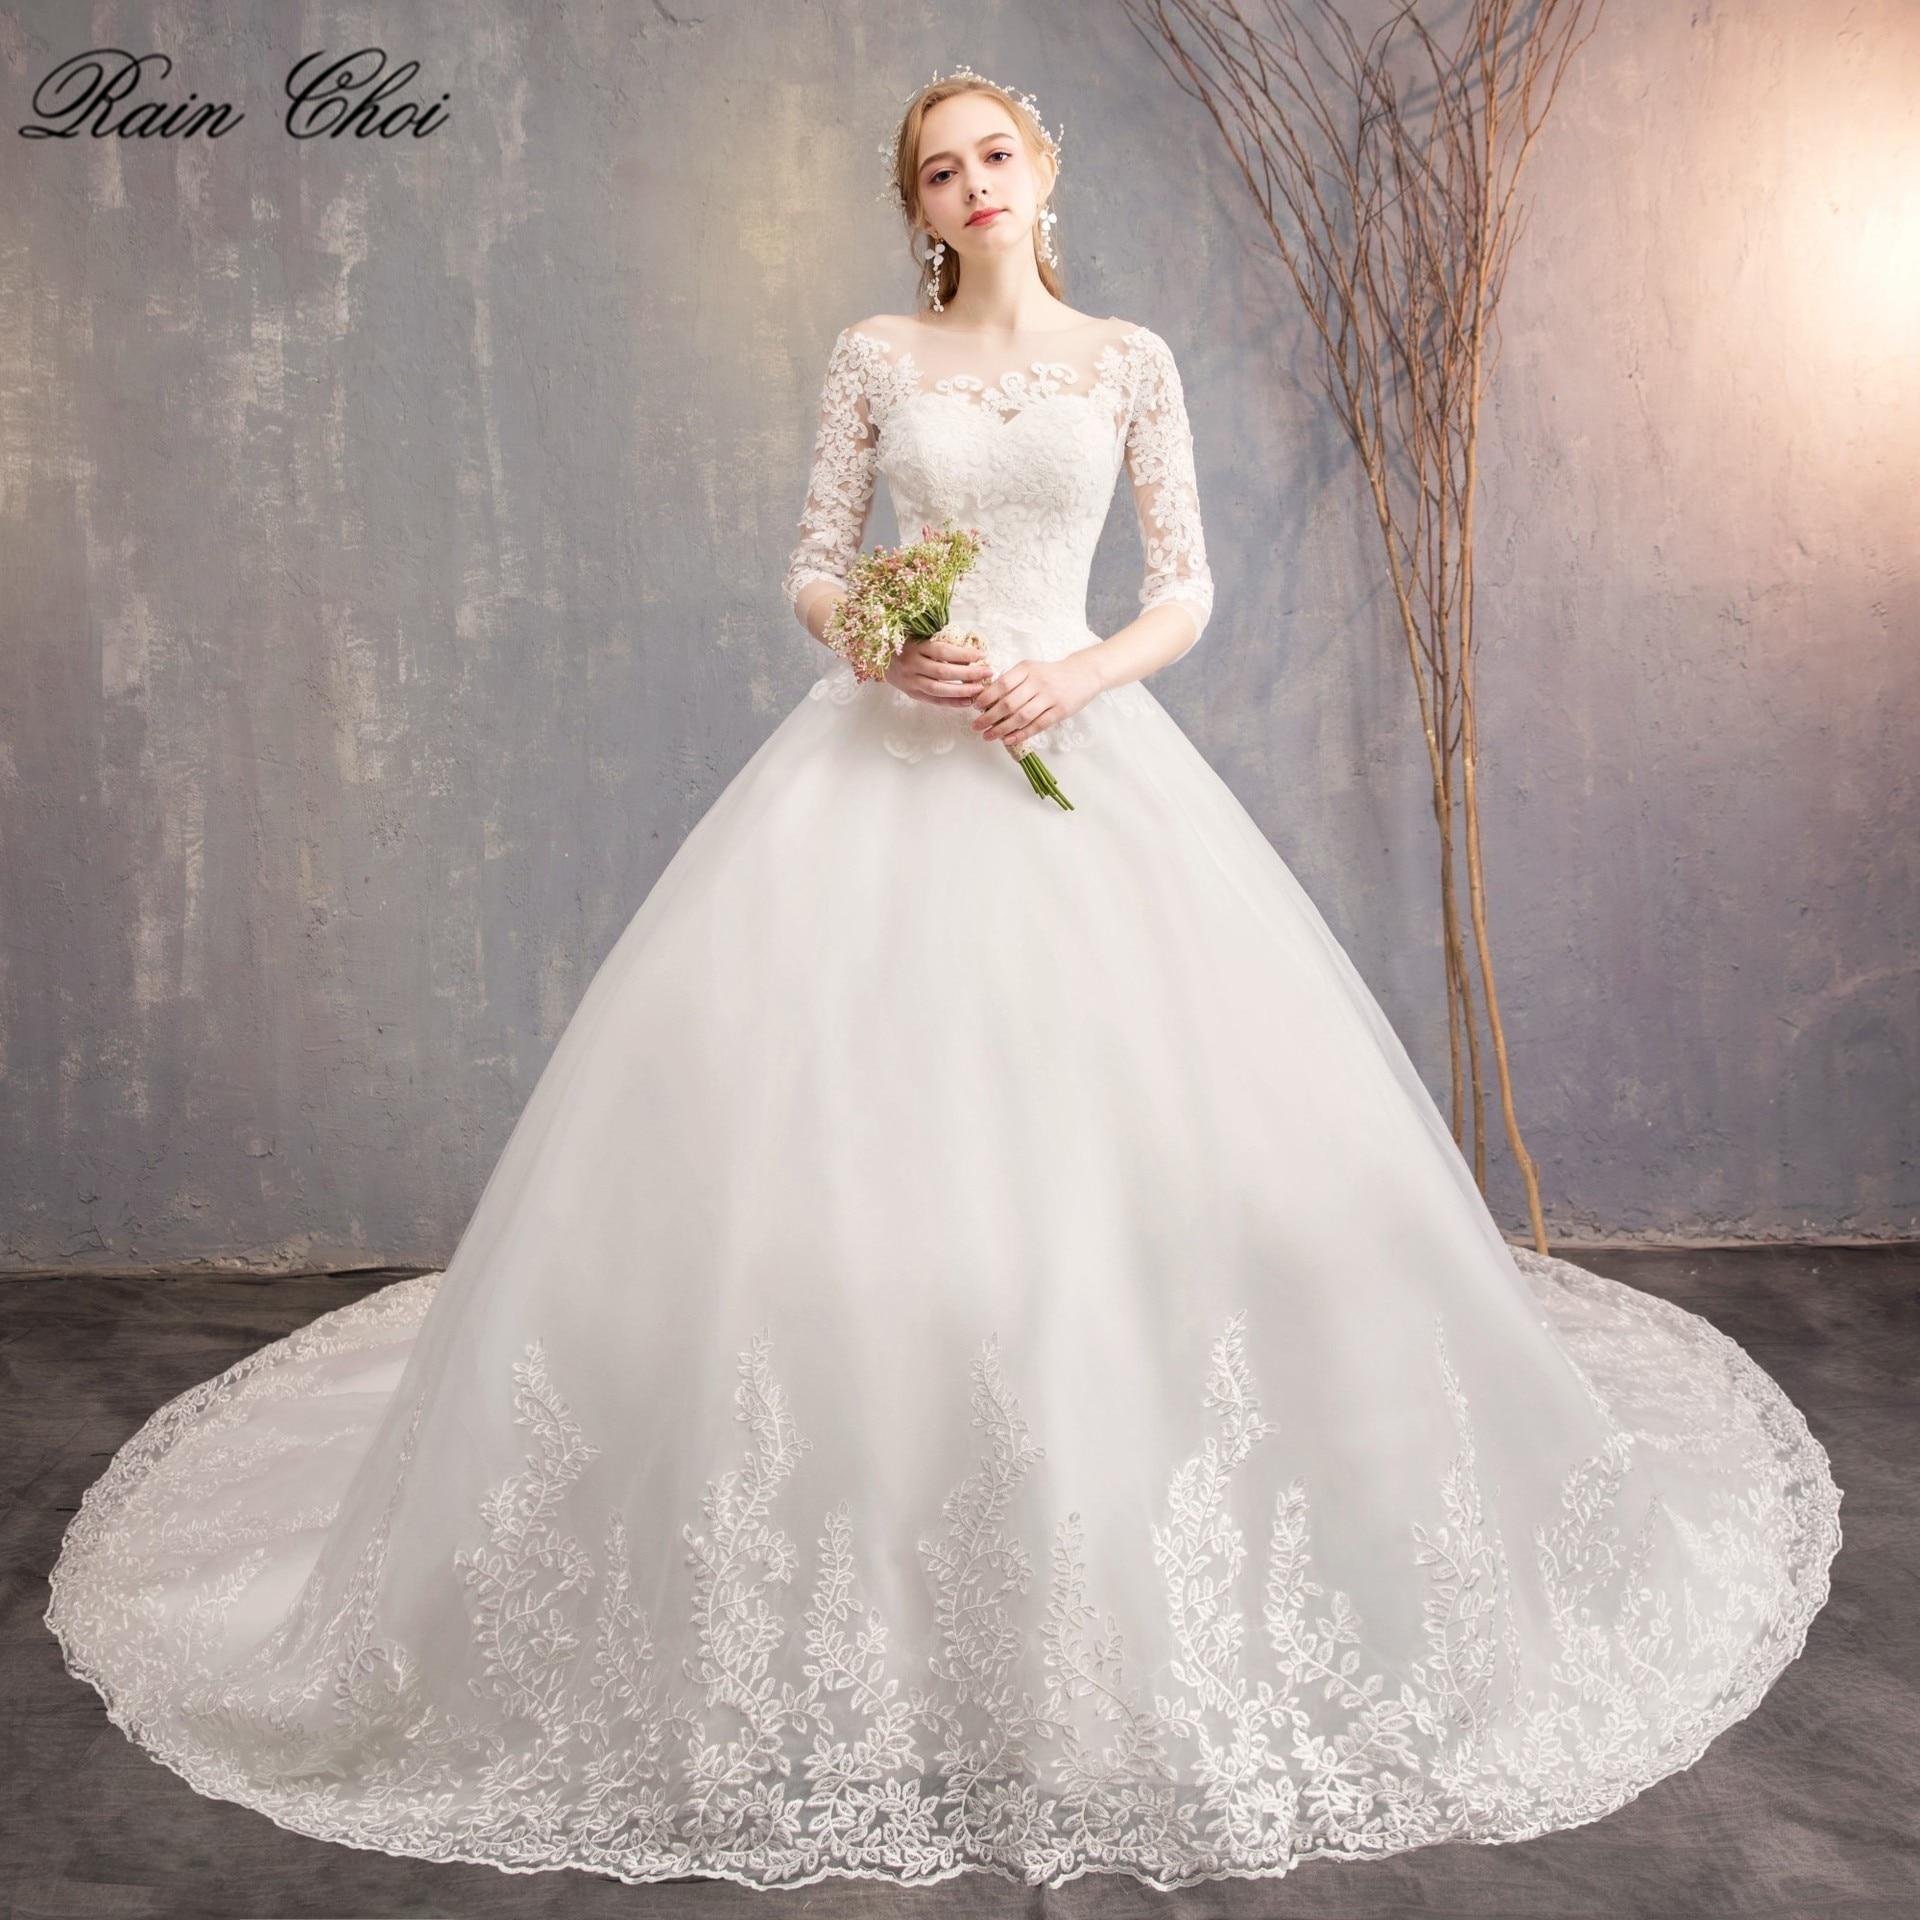 Vintage Wedding Dresses 2019 Lace Half Sleeve O Neck Plus